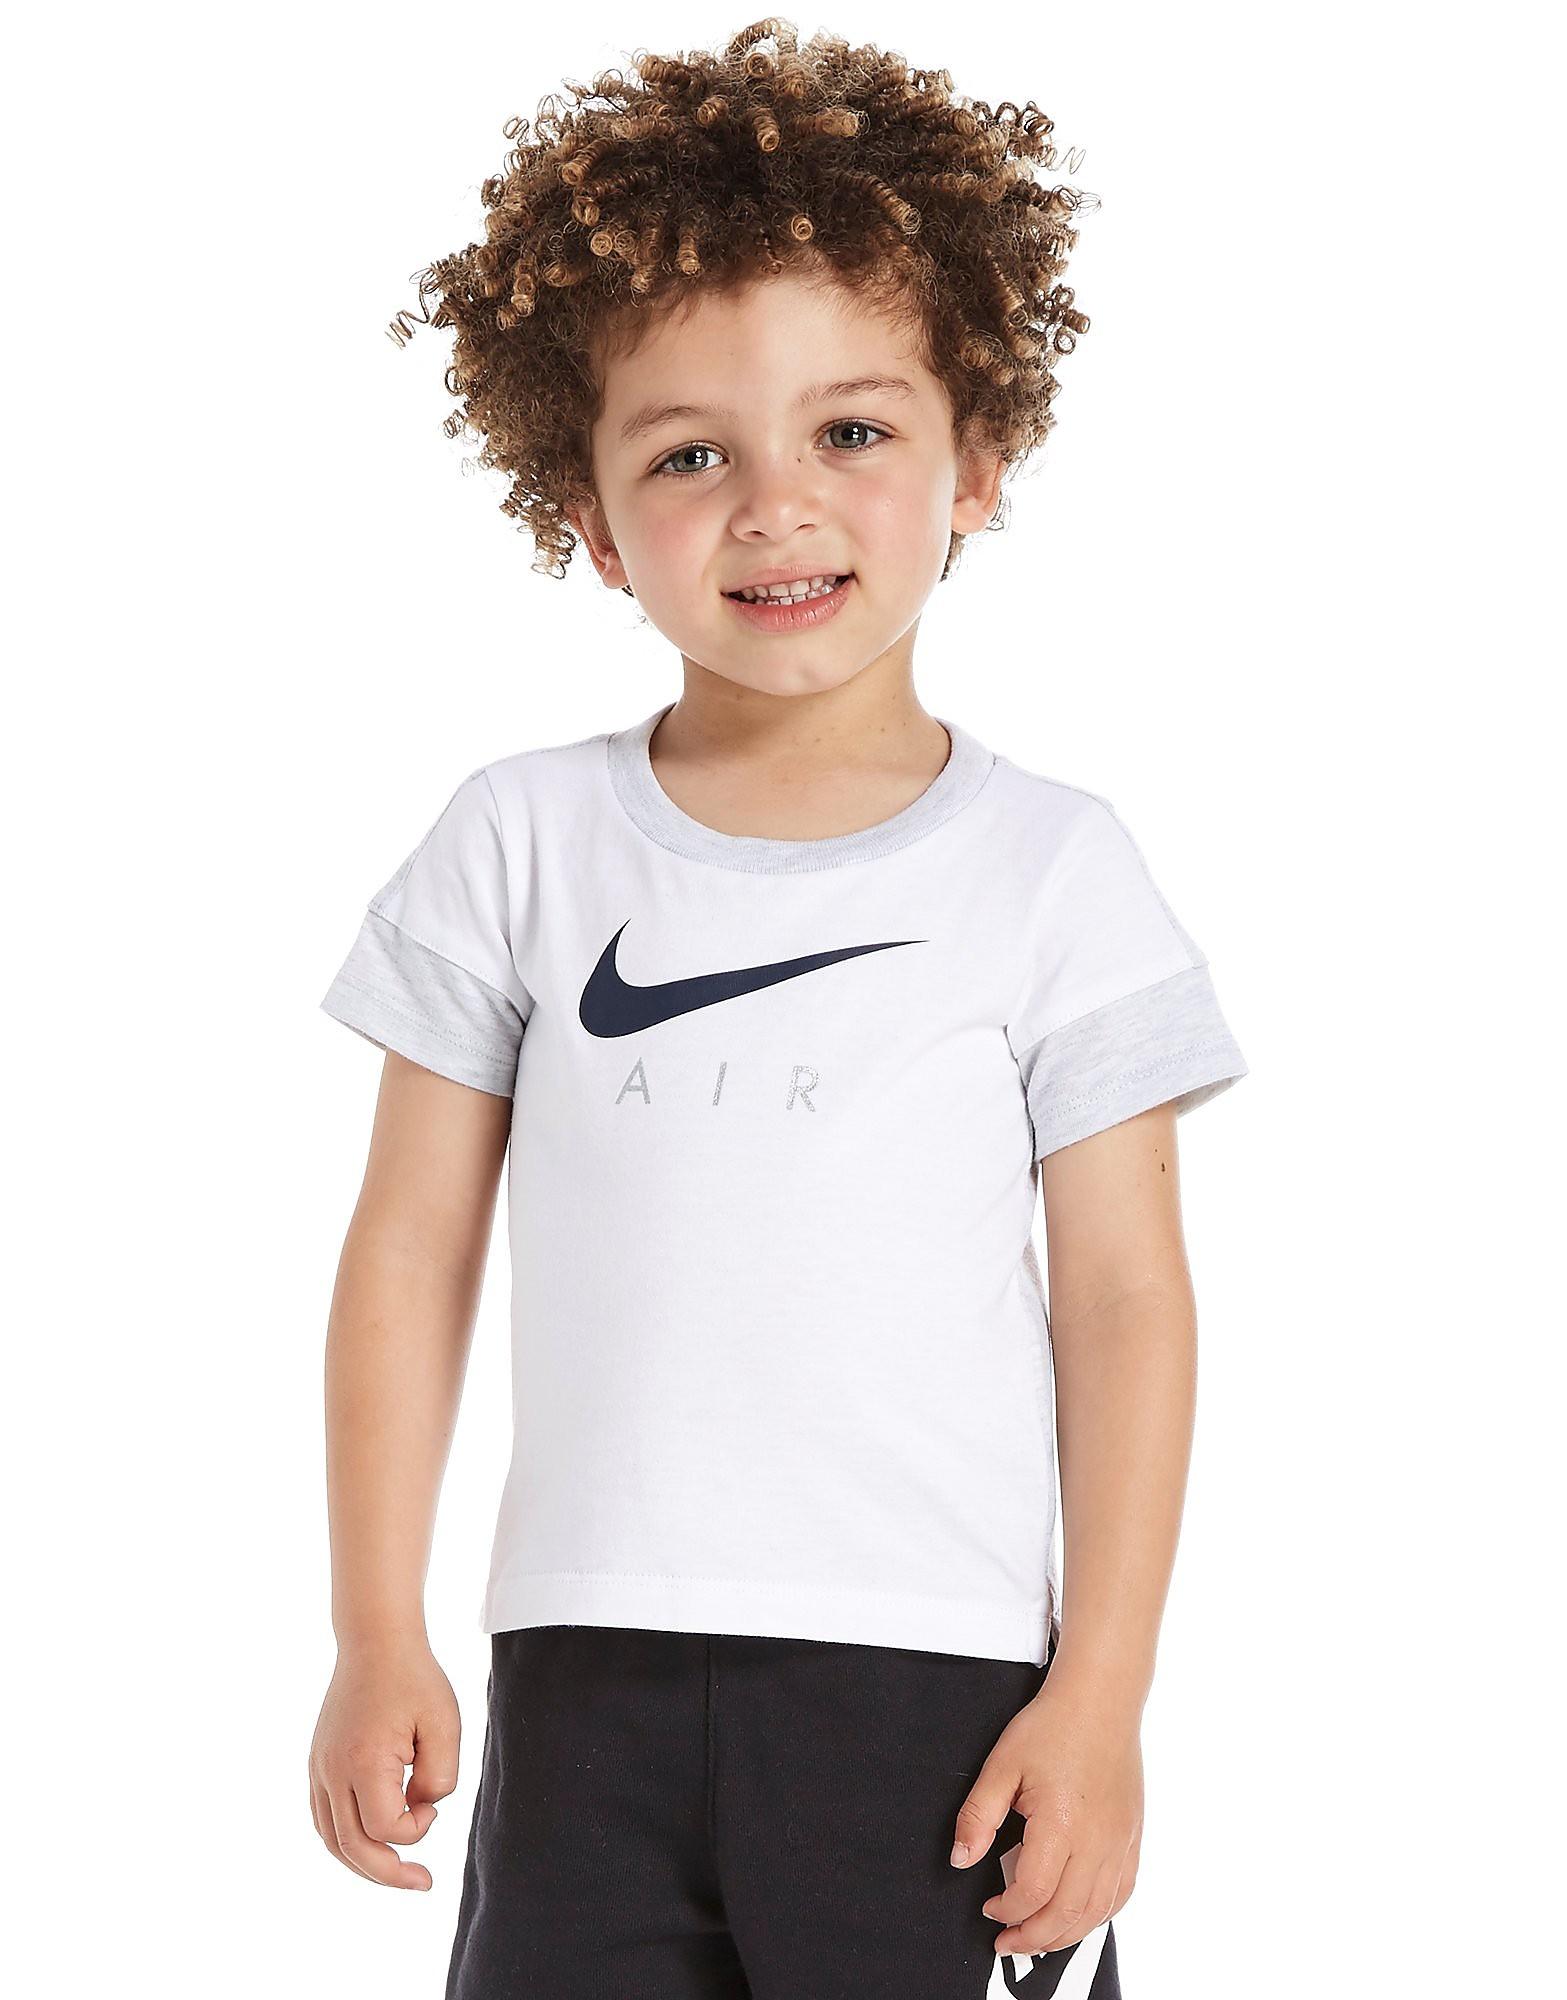 Nike Air T-Shirt Infant - Only at JD - White/Grey Marl, White/Grey Marl